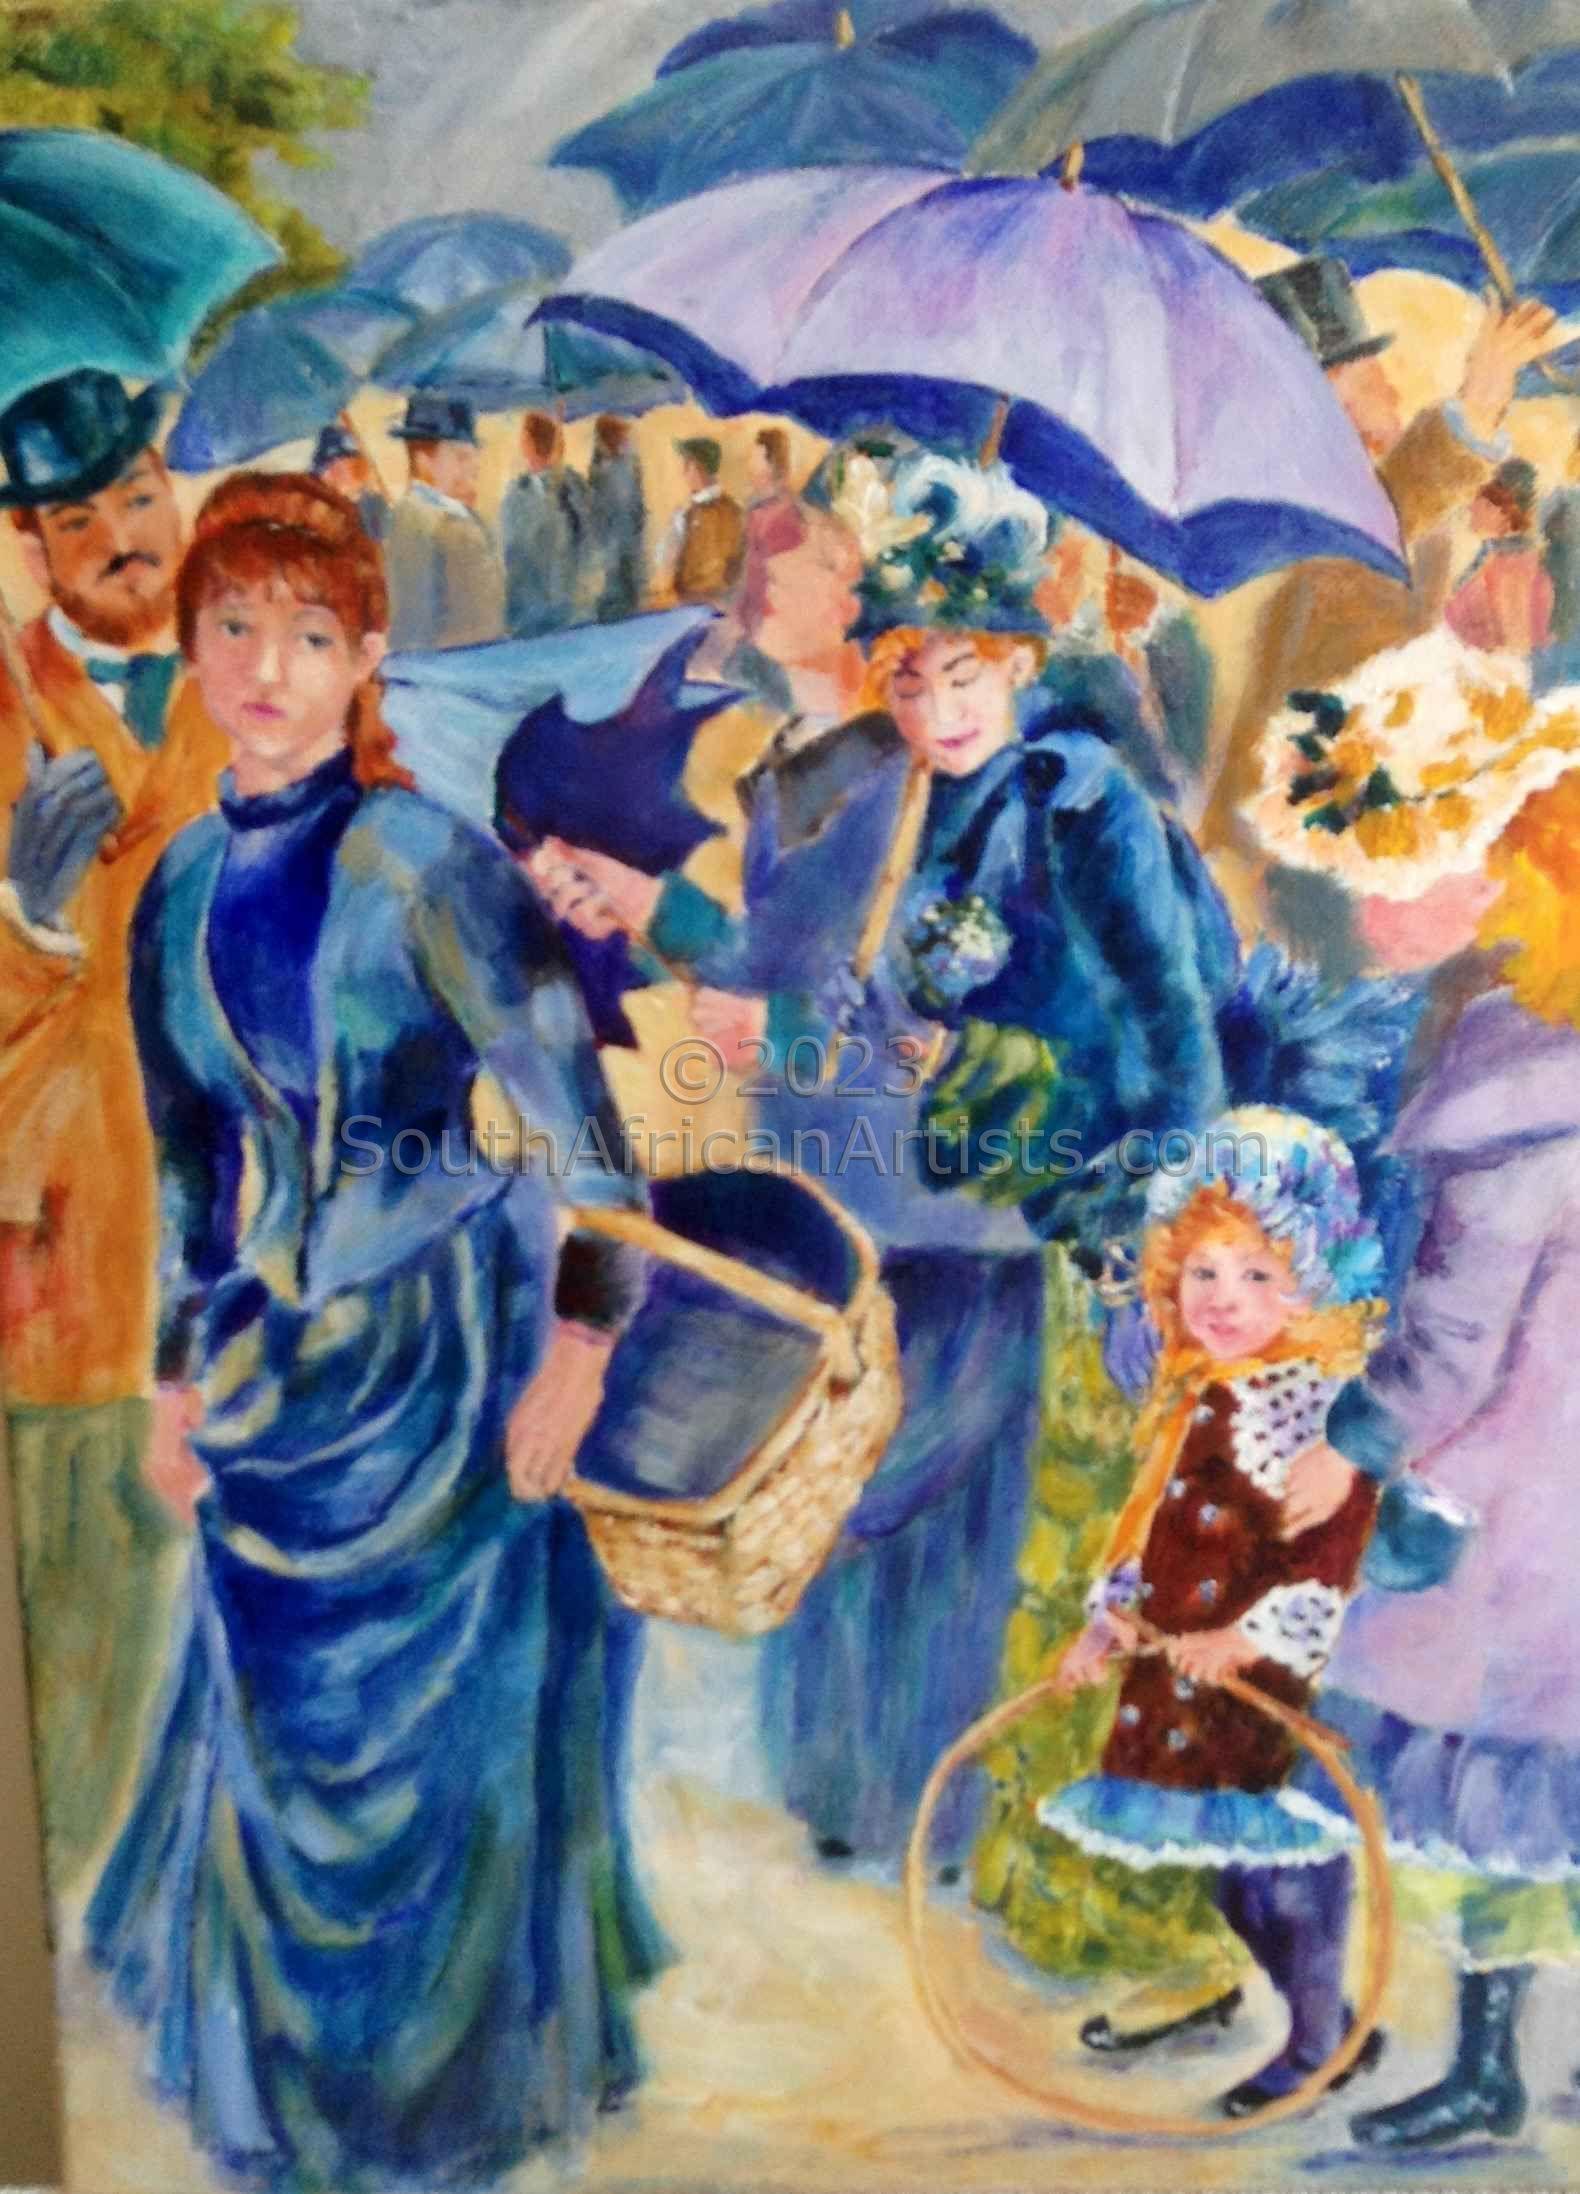 Umbrellas, After Renoir